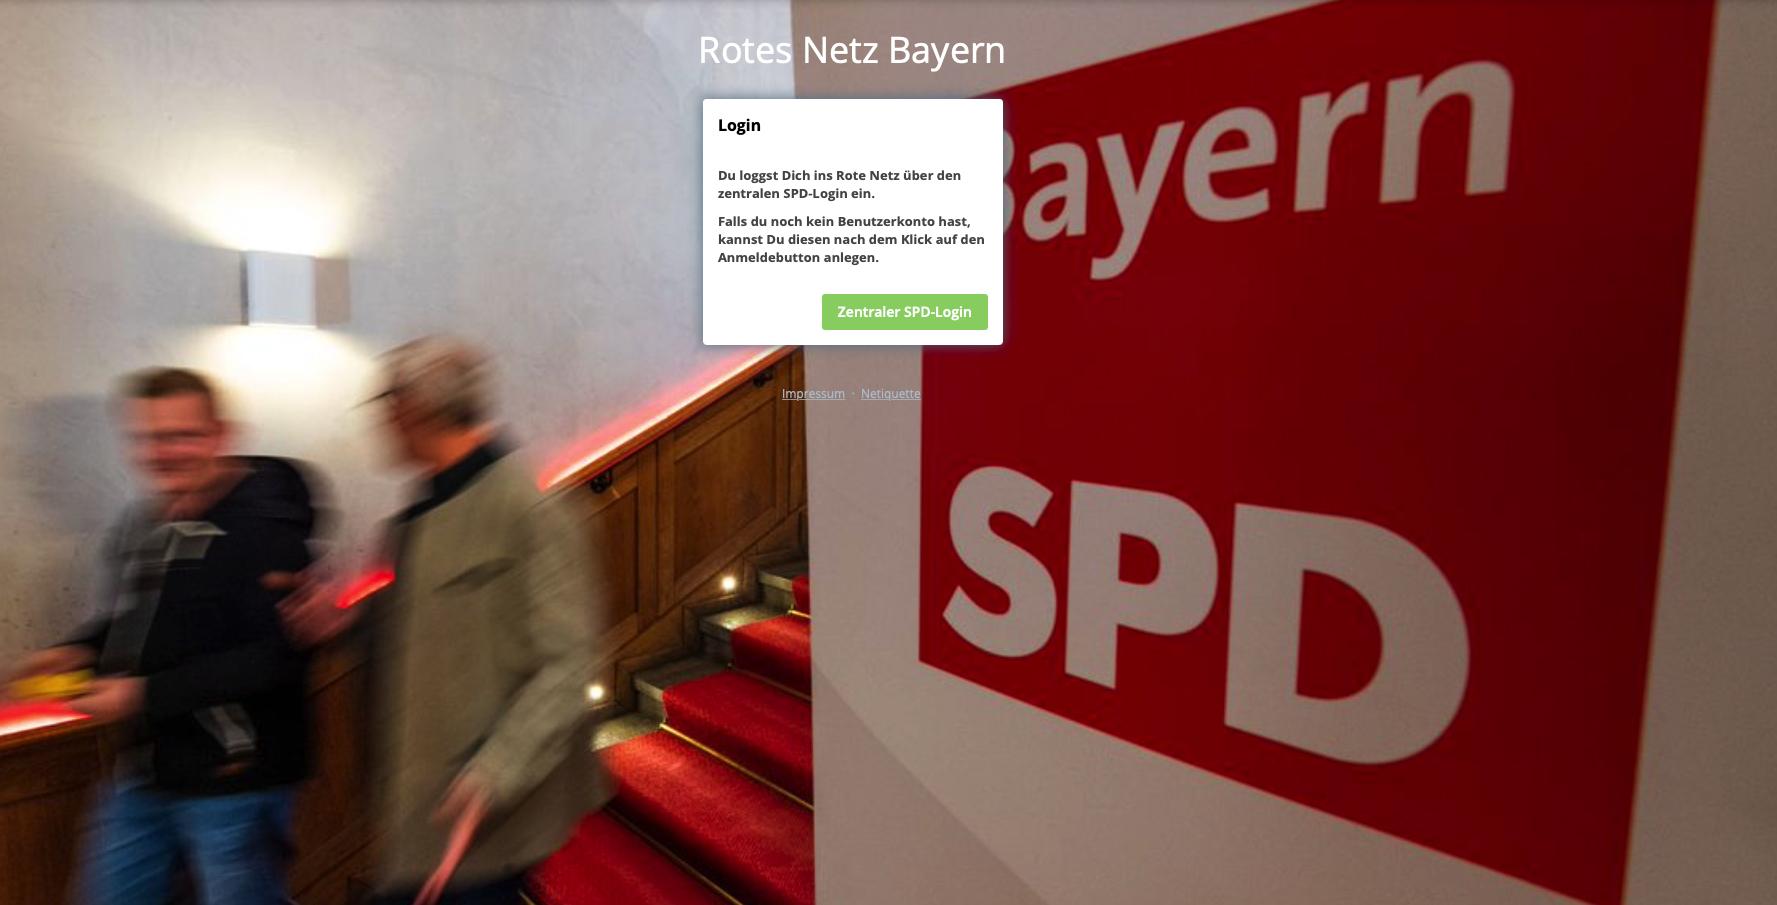 SPD Muggenhof nun Teil des Roten Netz